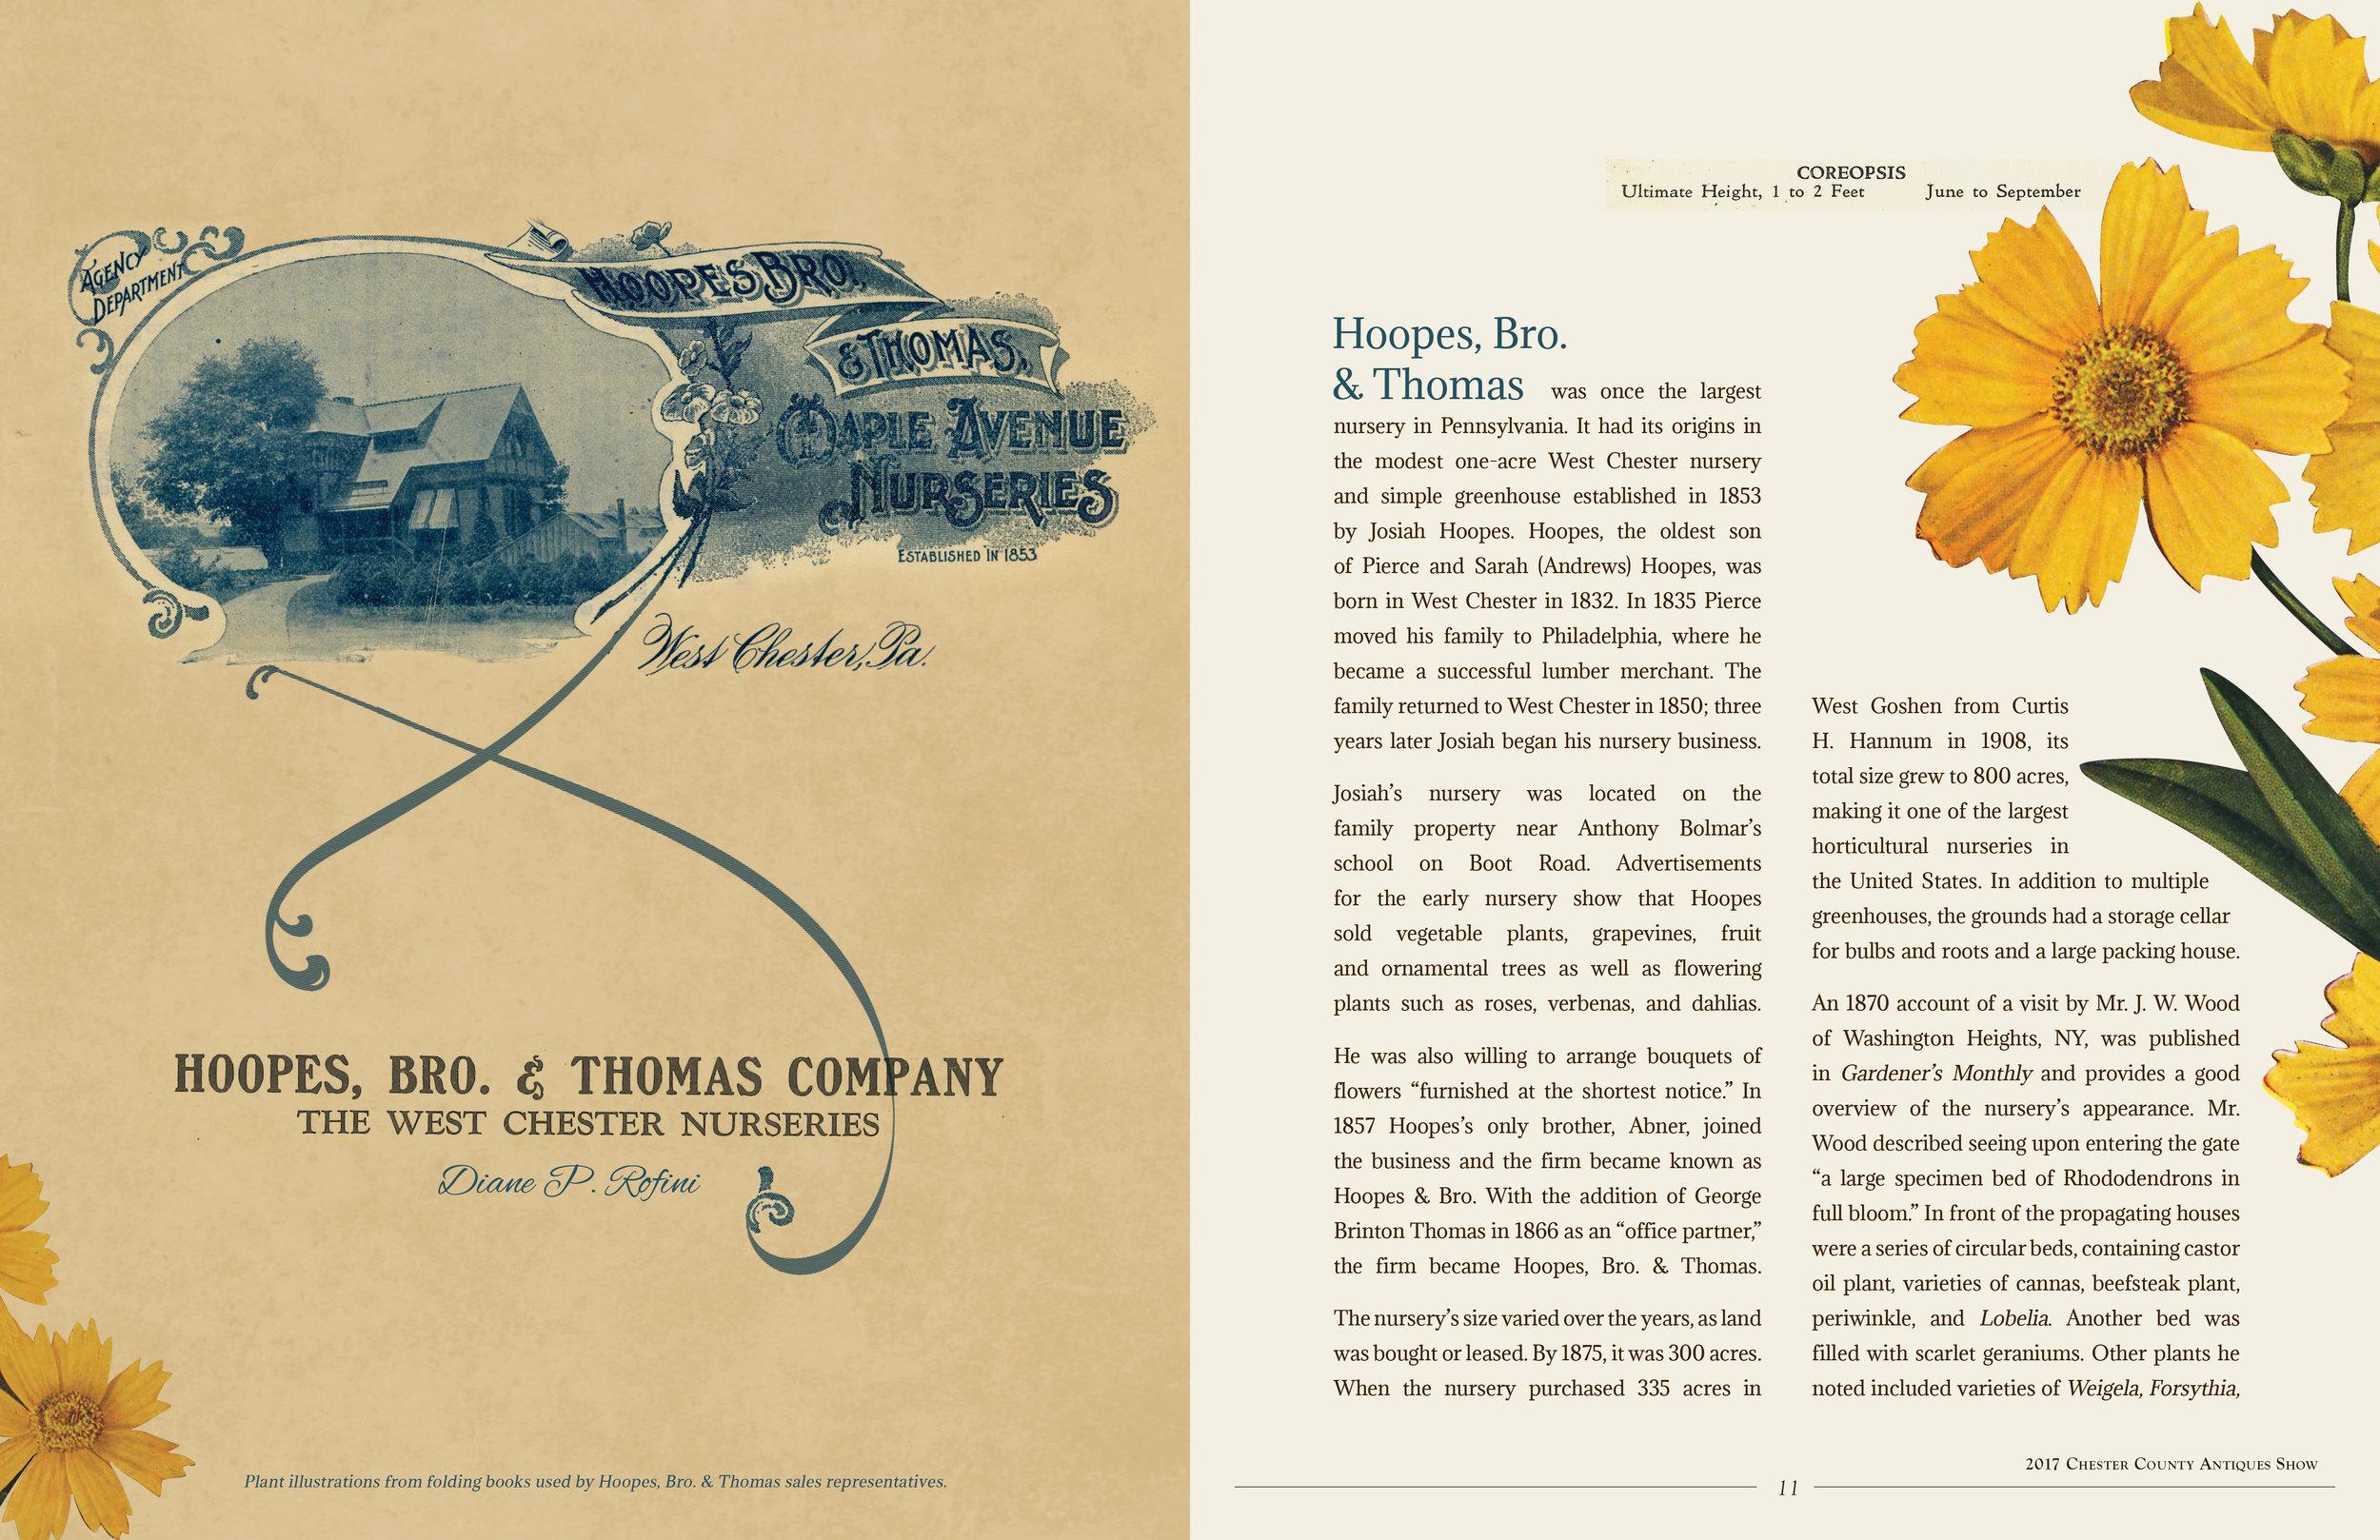 CCHS-Botany-spread1.jpg